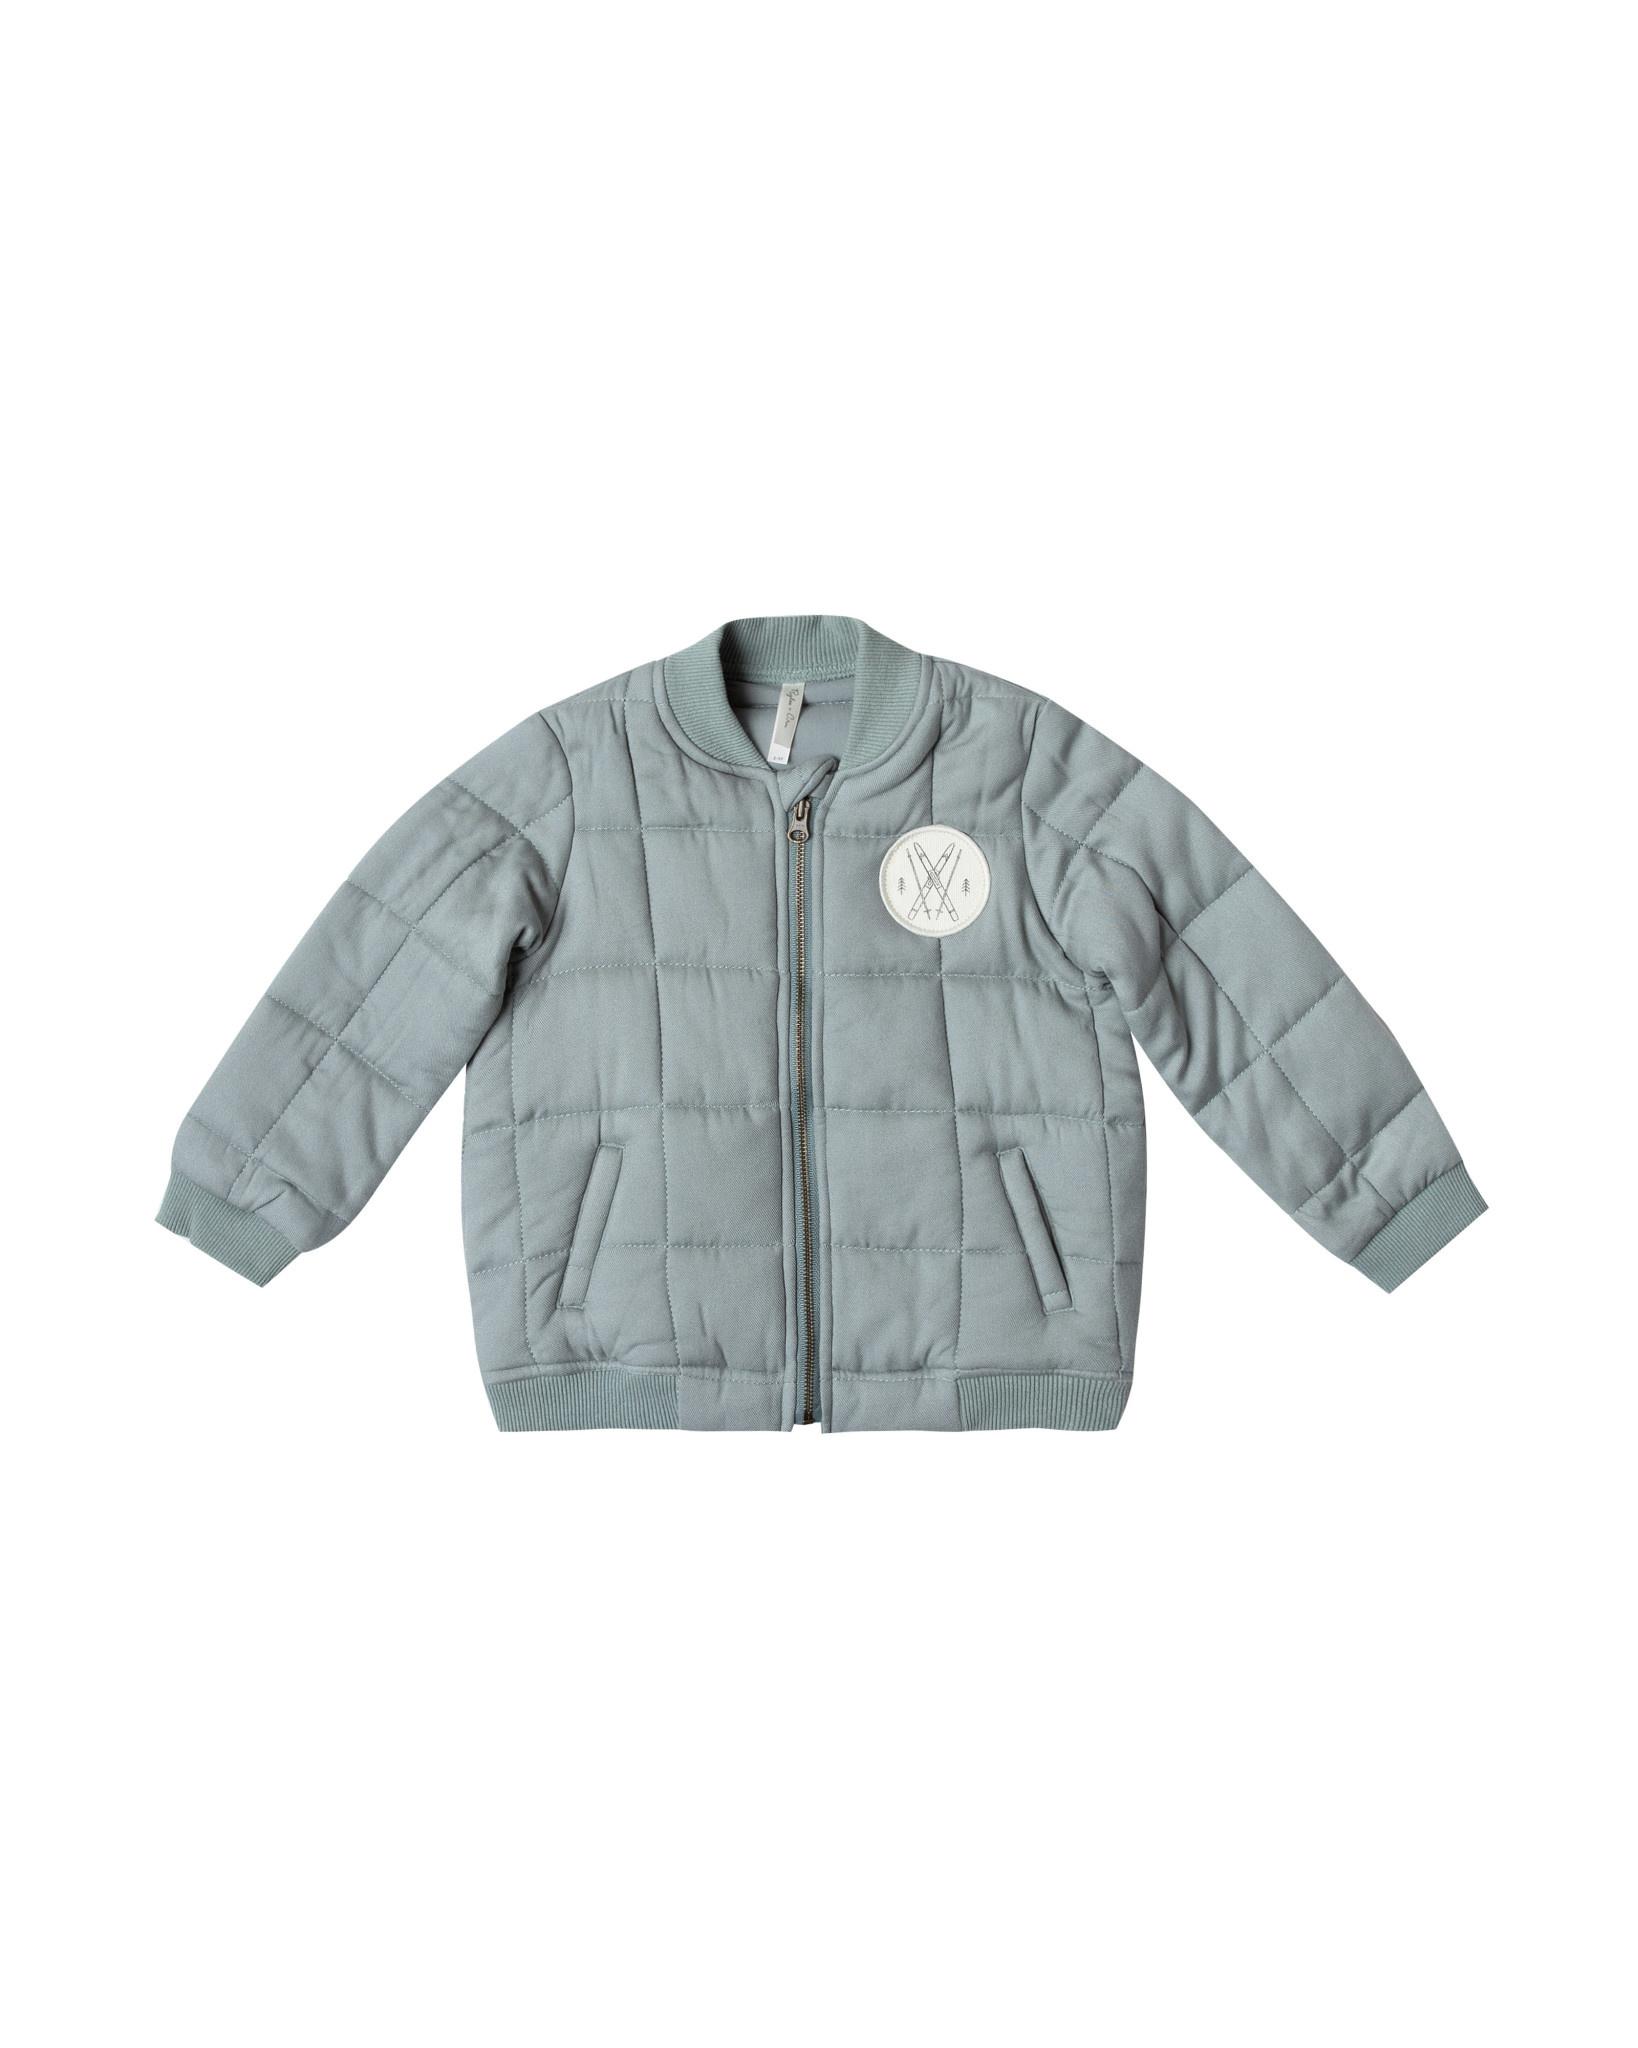 Rylee & Cru Quilted Blue Bomber Jacket Baby